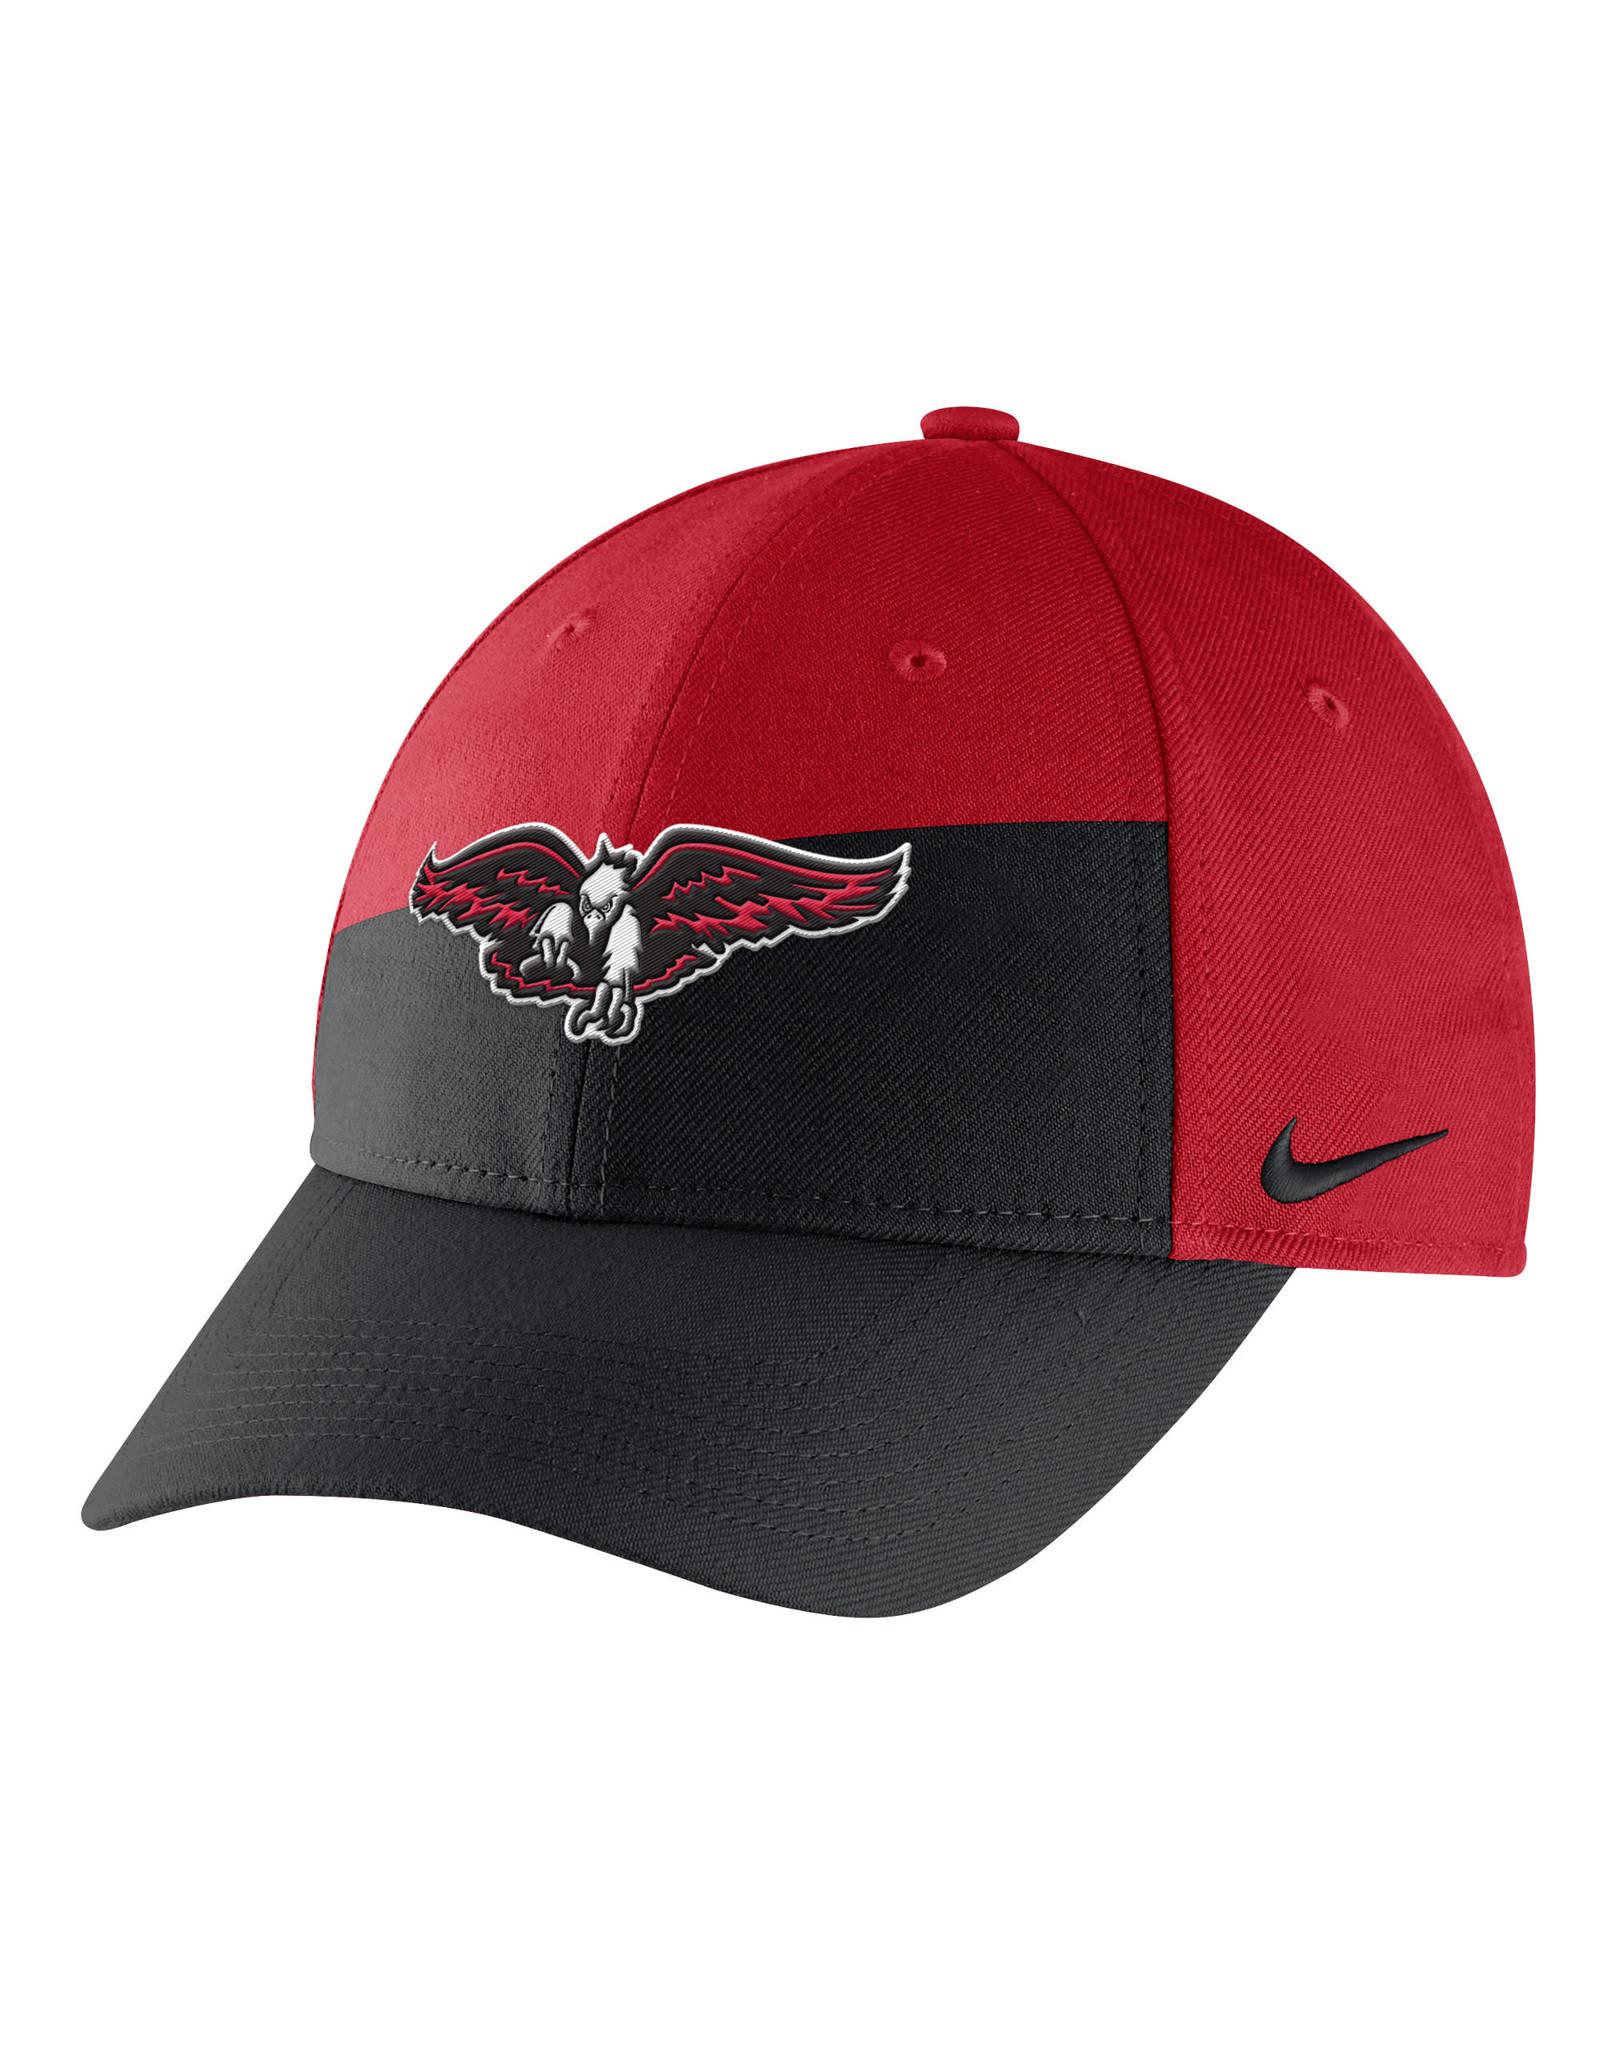 NIKE CAP Youth Swoosh Flex Black/Red Eagle by NIKE